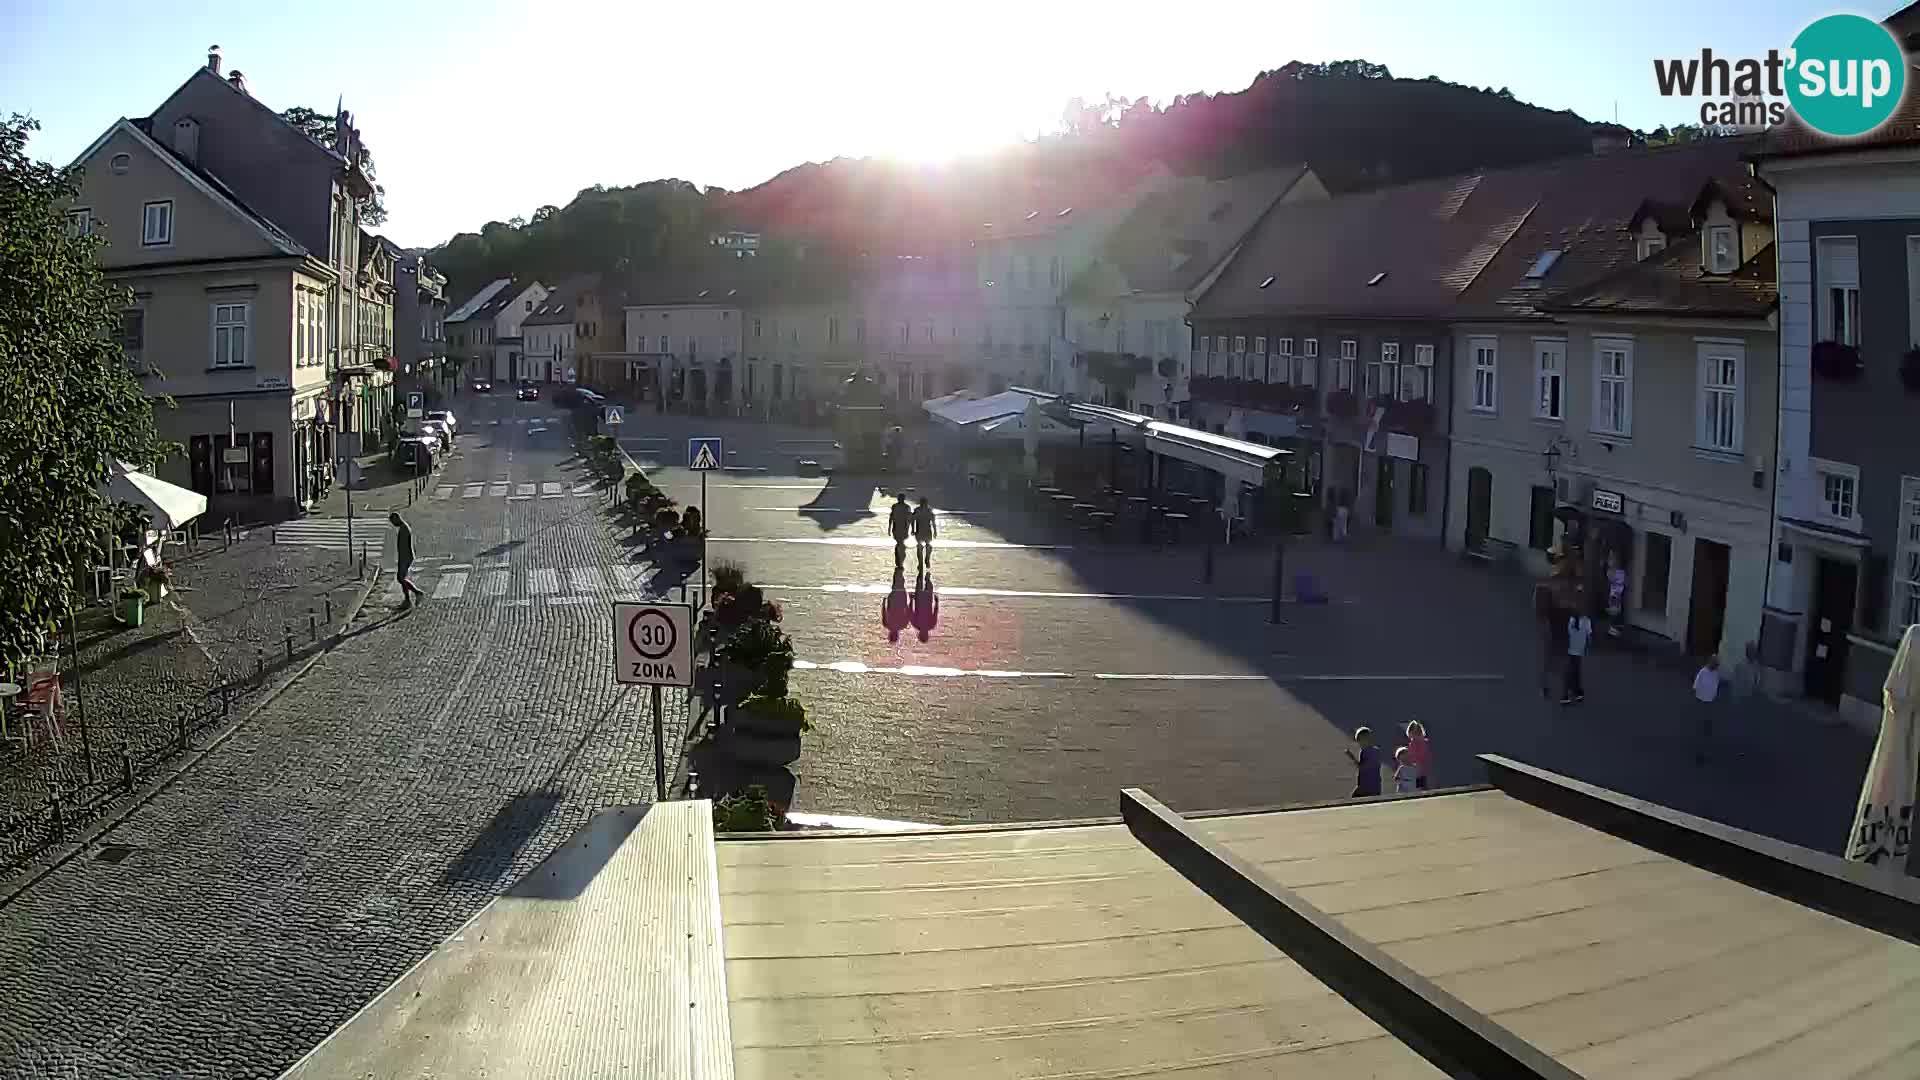 Samobor – Piazza centrale dedicata a re Tomislav